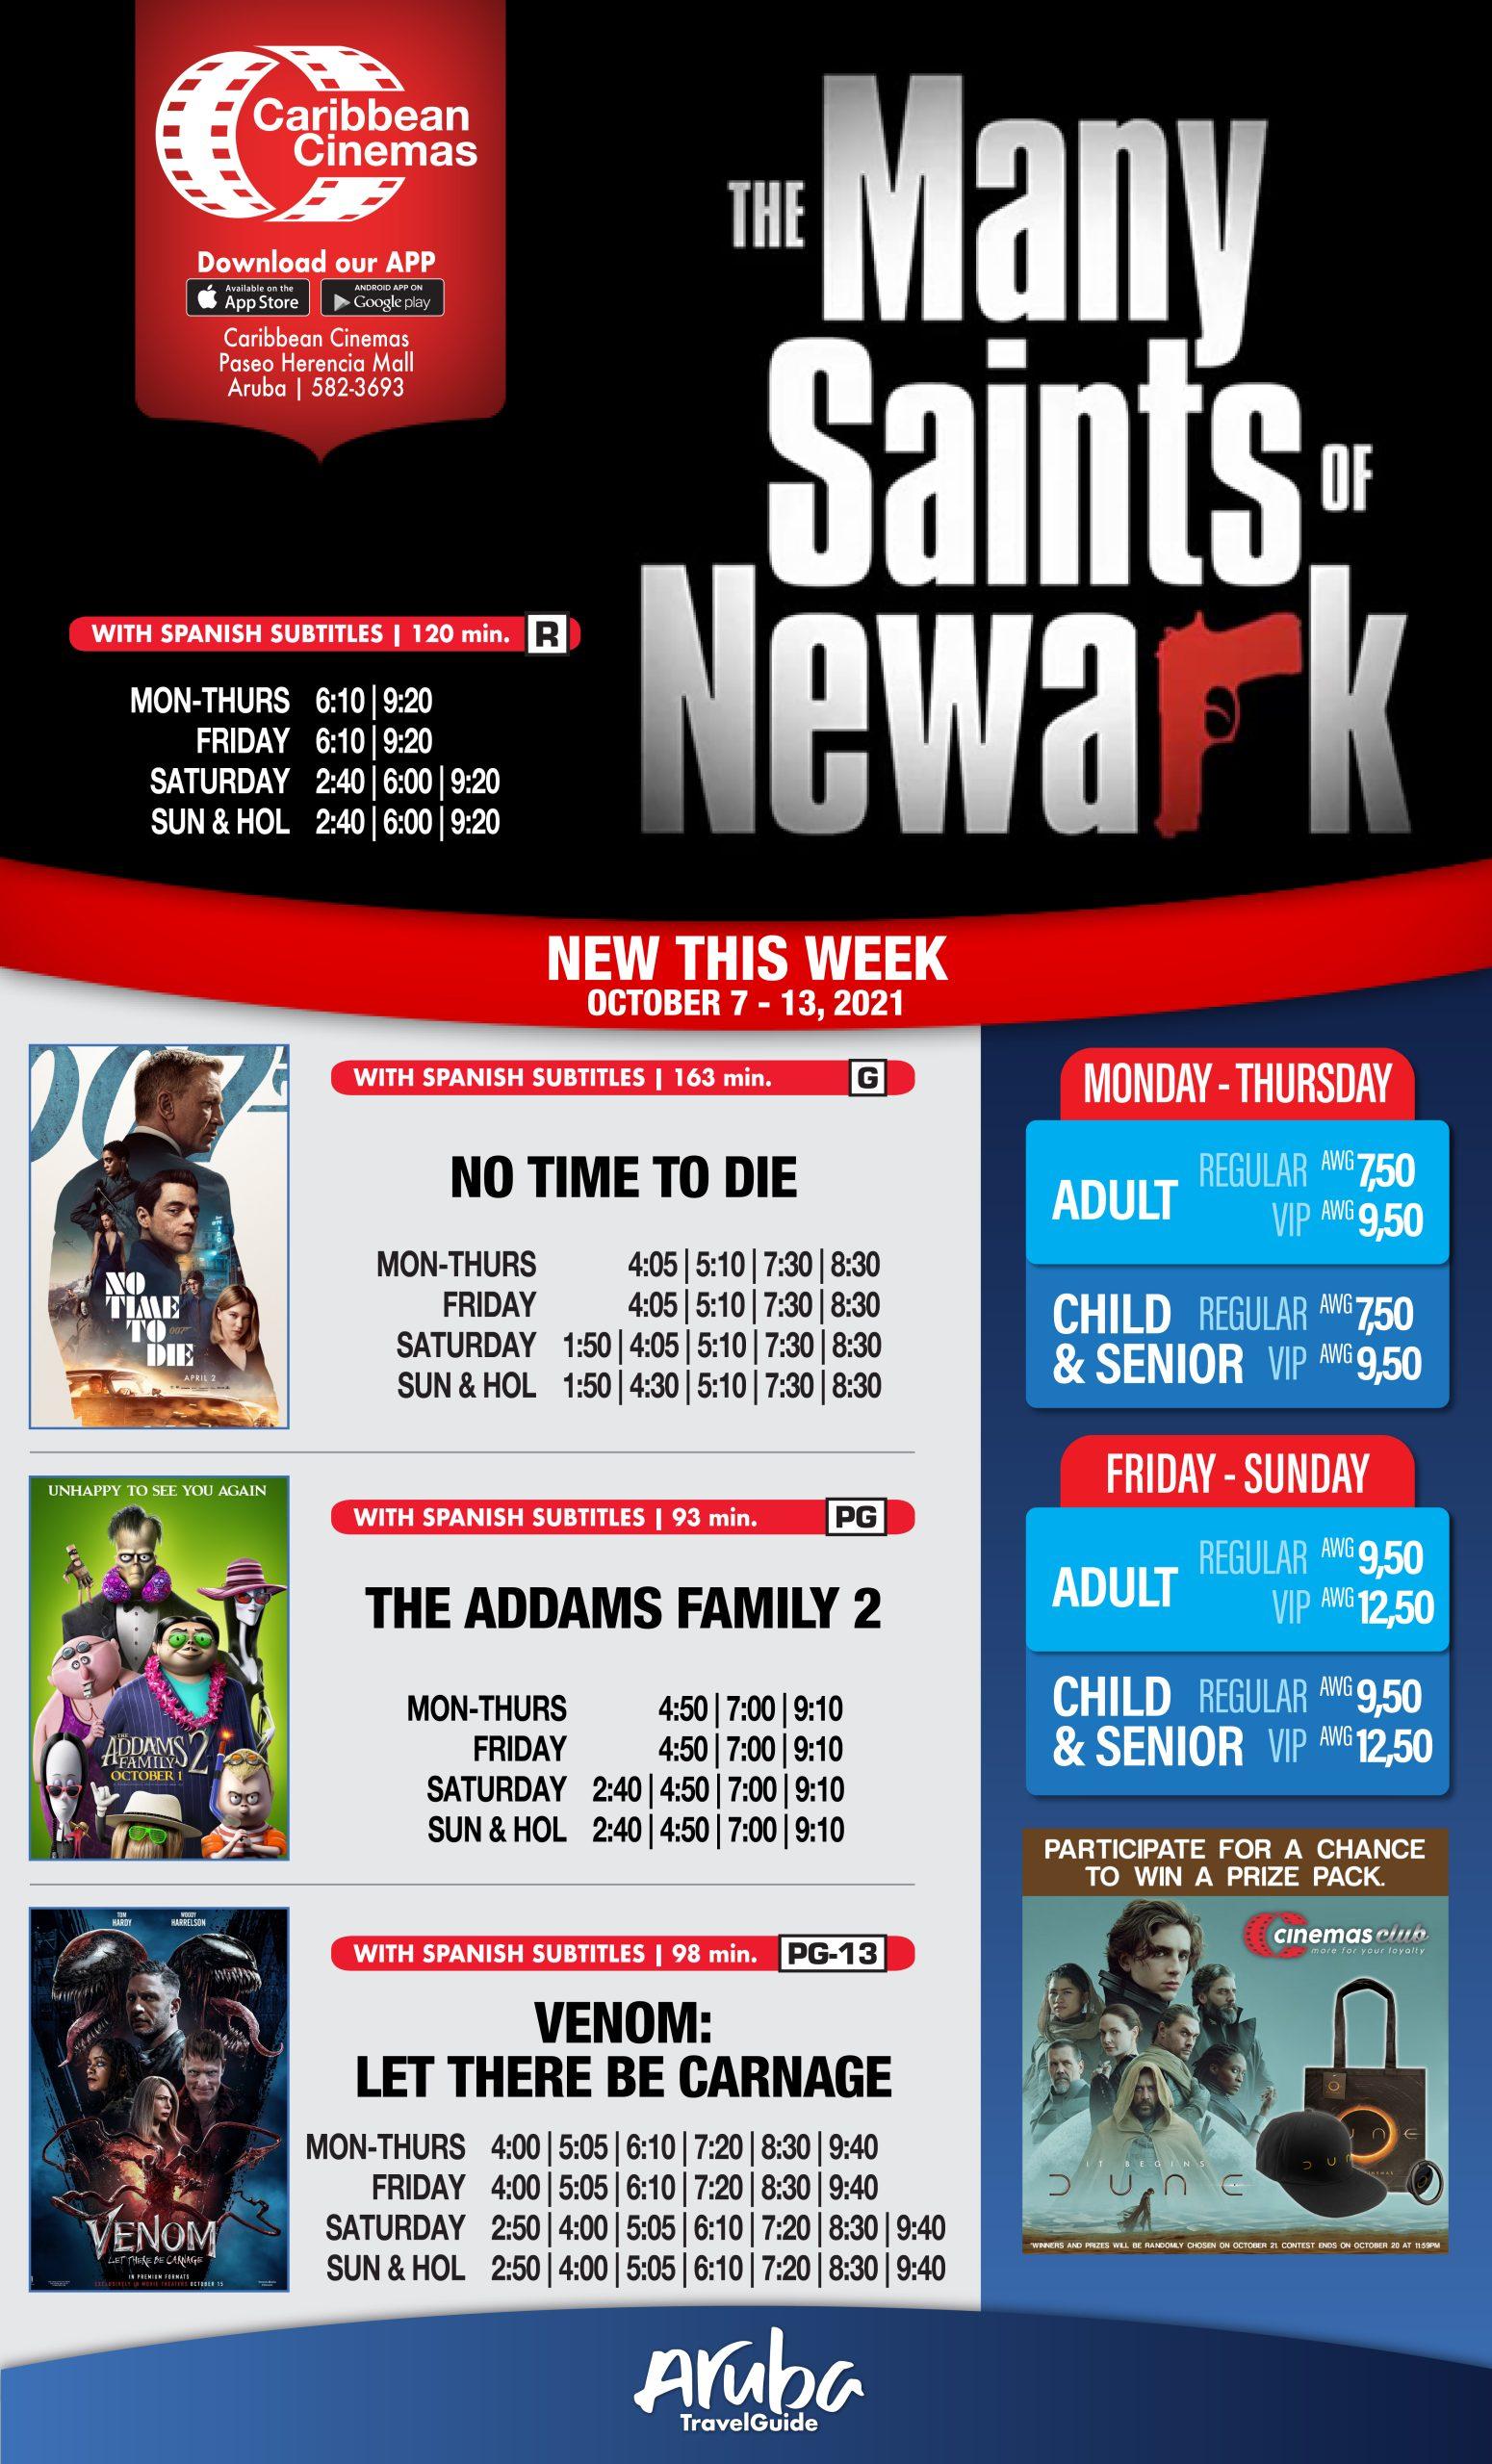 Welcome, Caribbean Cinemas to Aruba Tourist Channel!